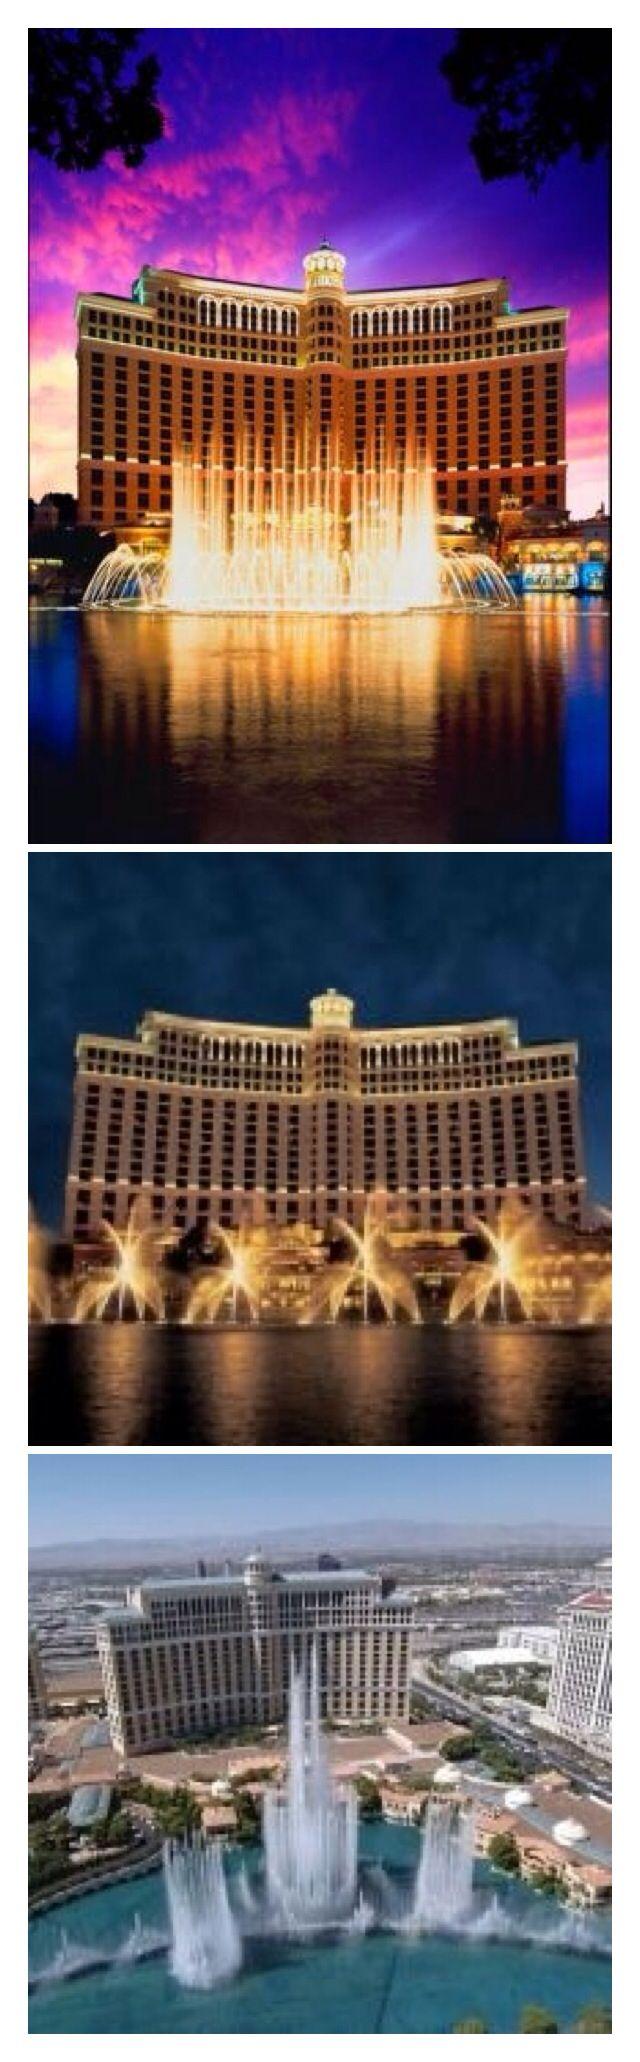 The Bellagio Hotel/Casino - Las Vegas Strip Nevada #Luxurydotcom